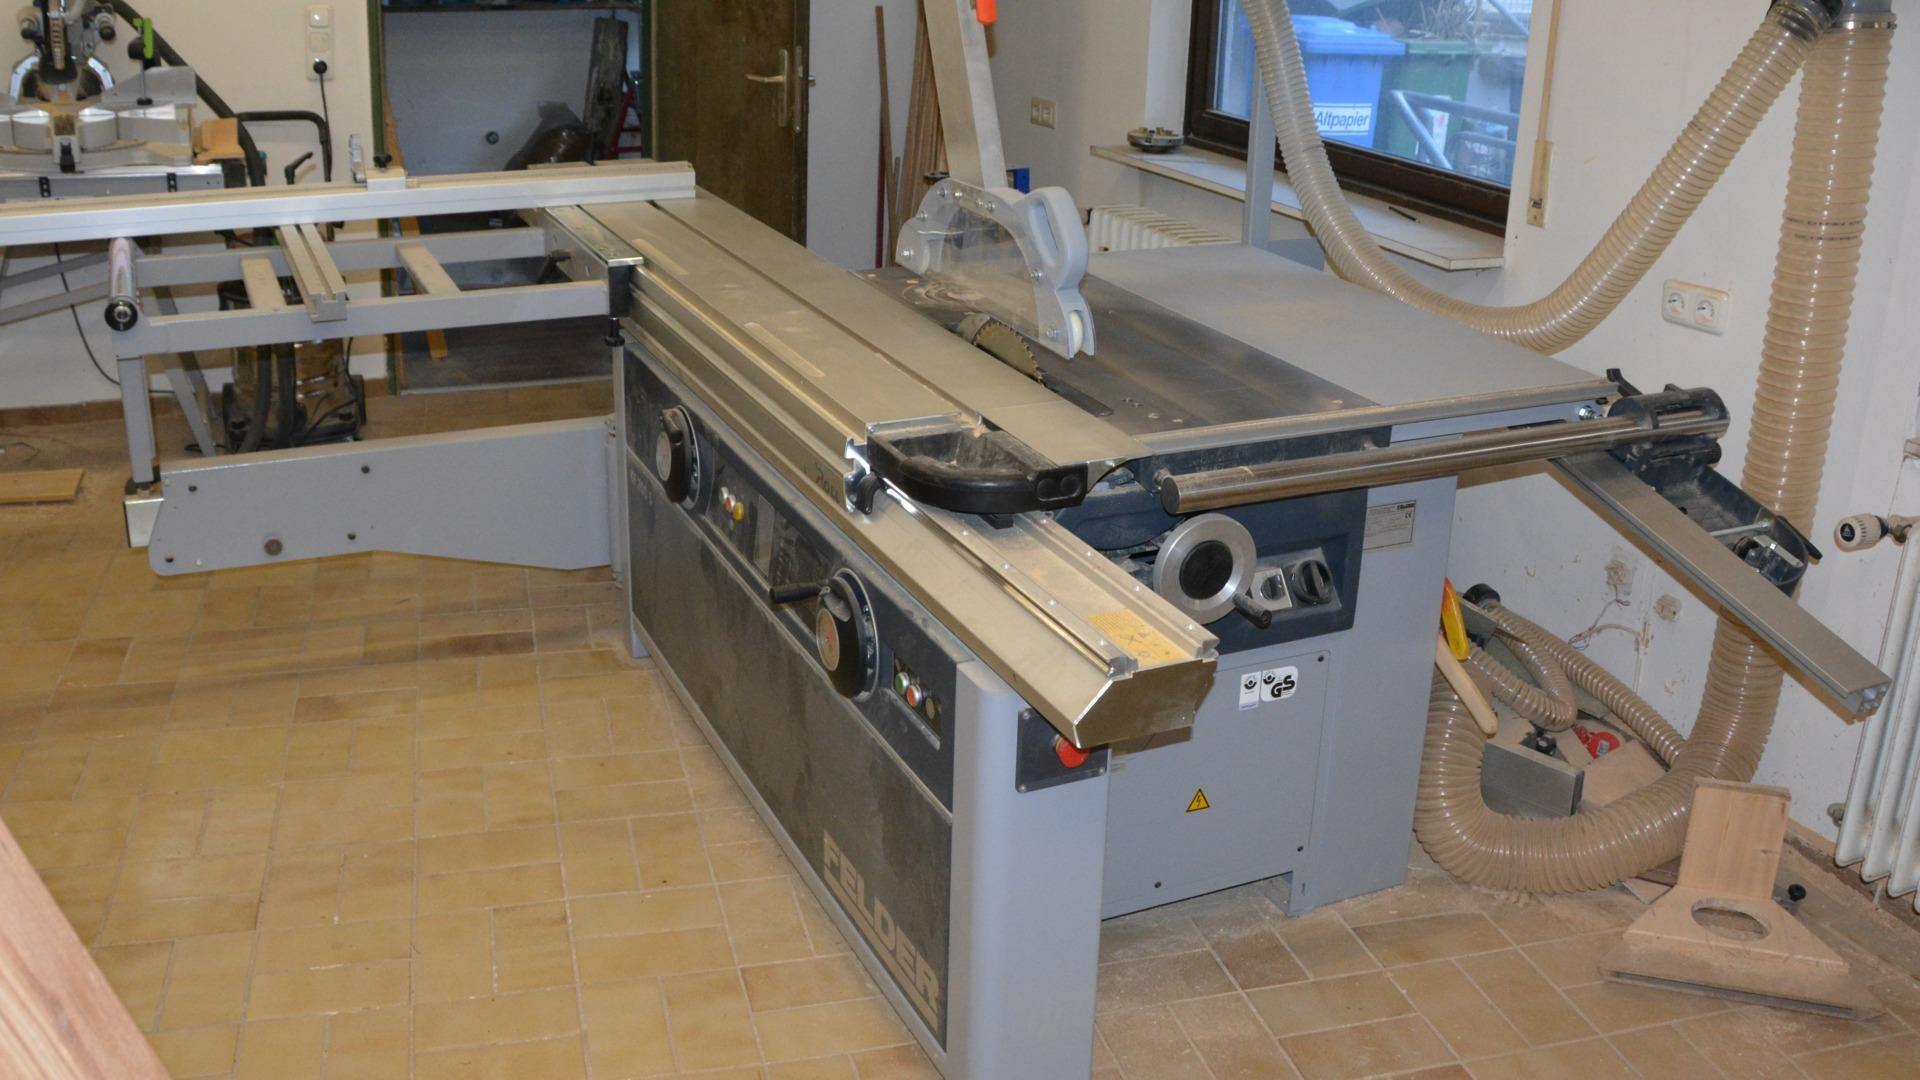 Felder Kf700 Tablesaw And Shaper Way Of Wood